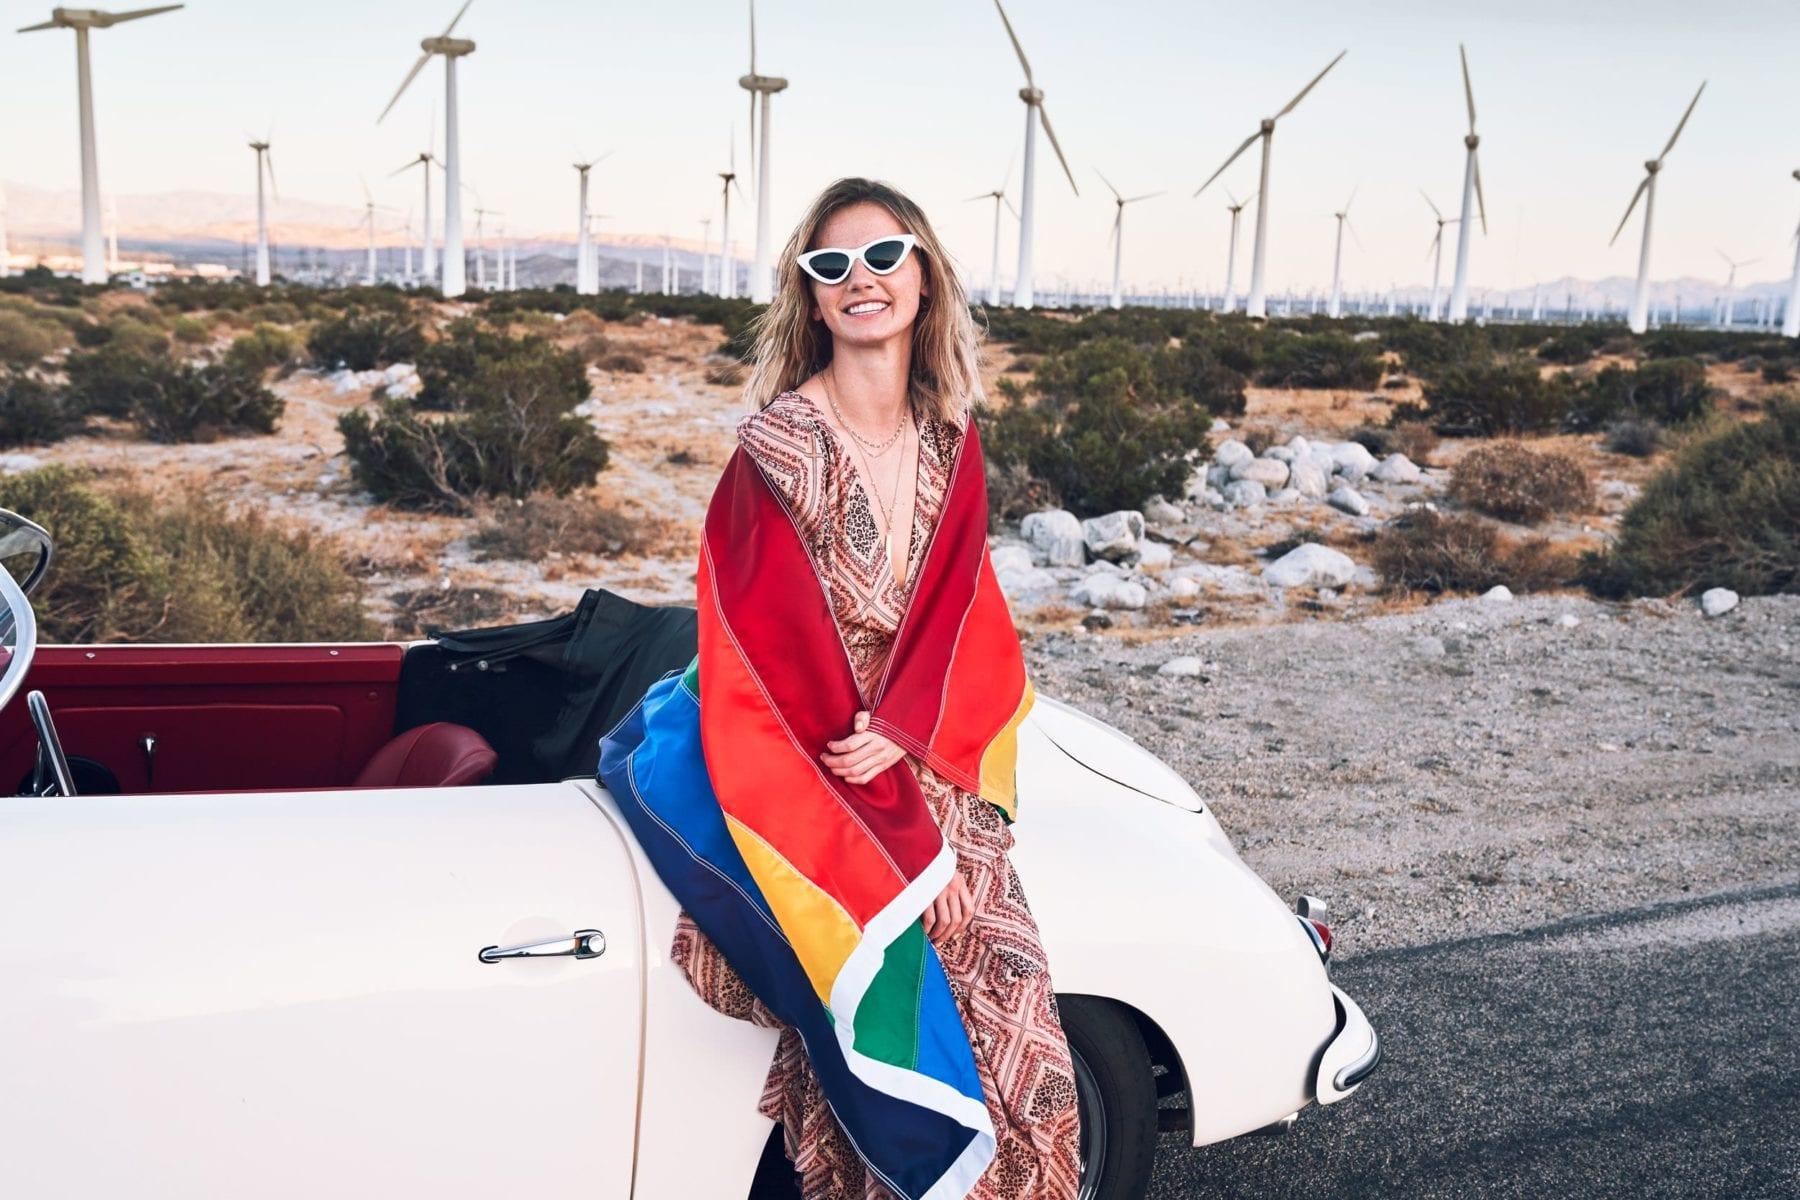 DESERT_HILLS_PO_PORSCHE_LGBTQ_FINAL_RGB